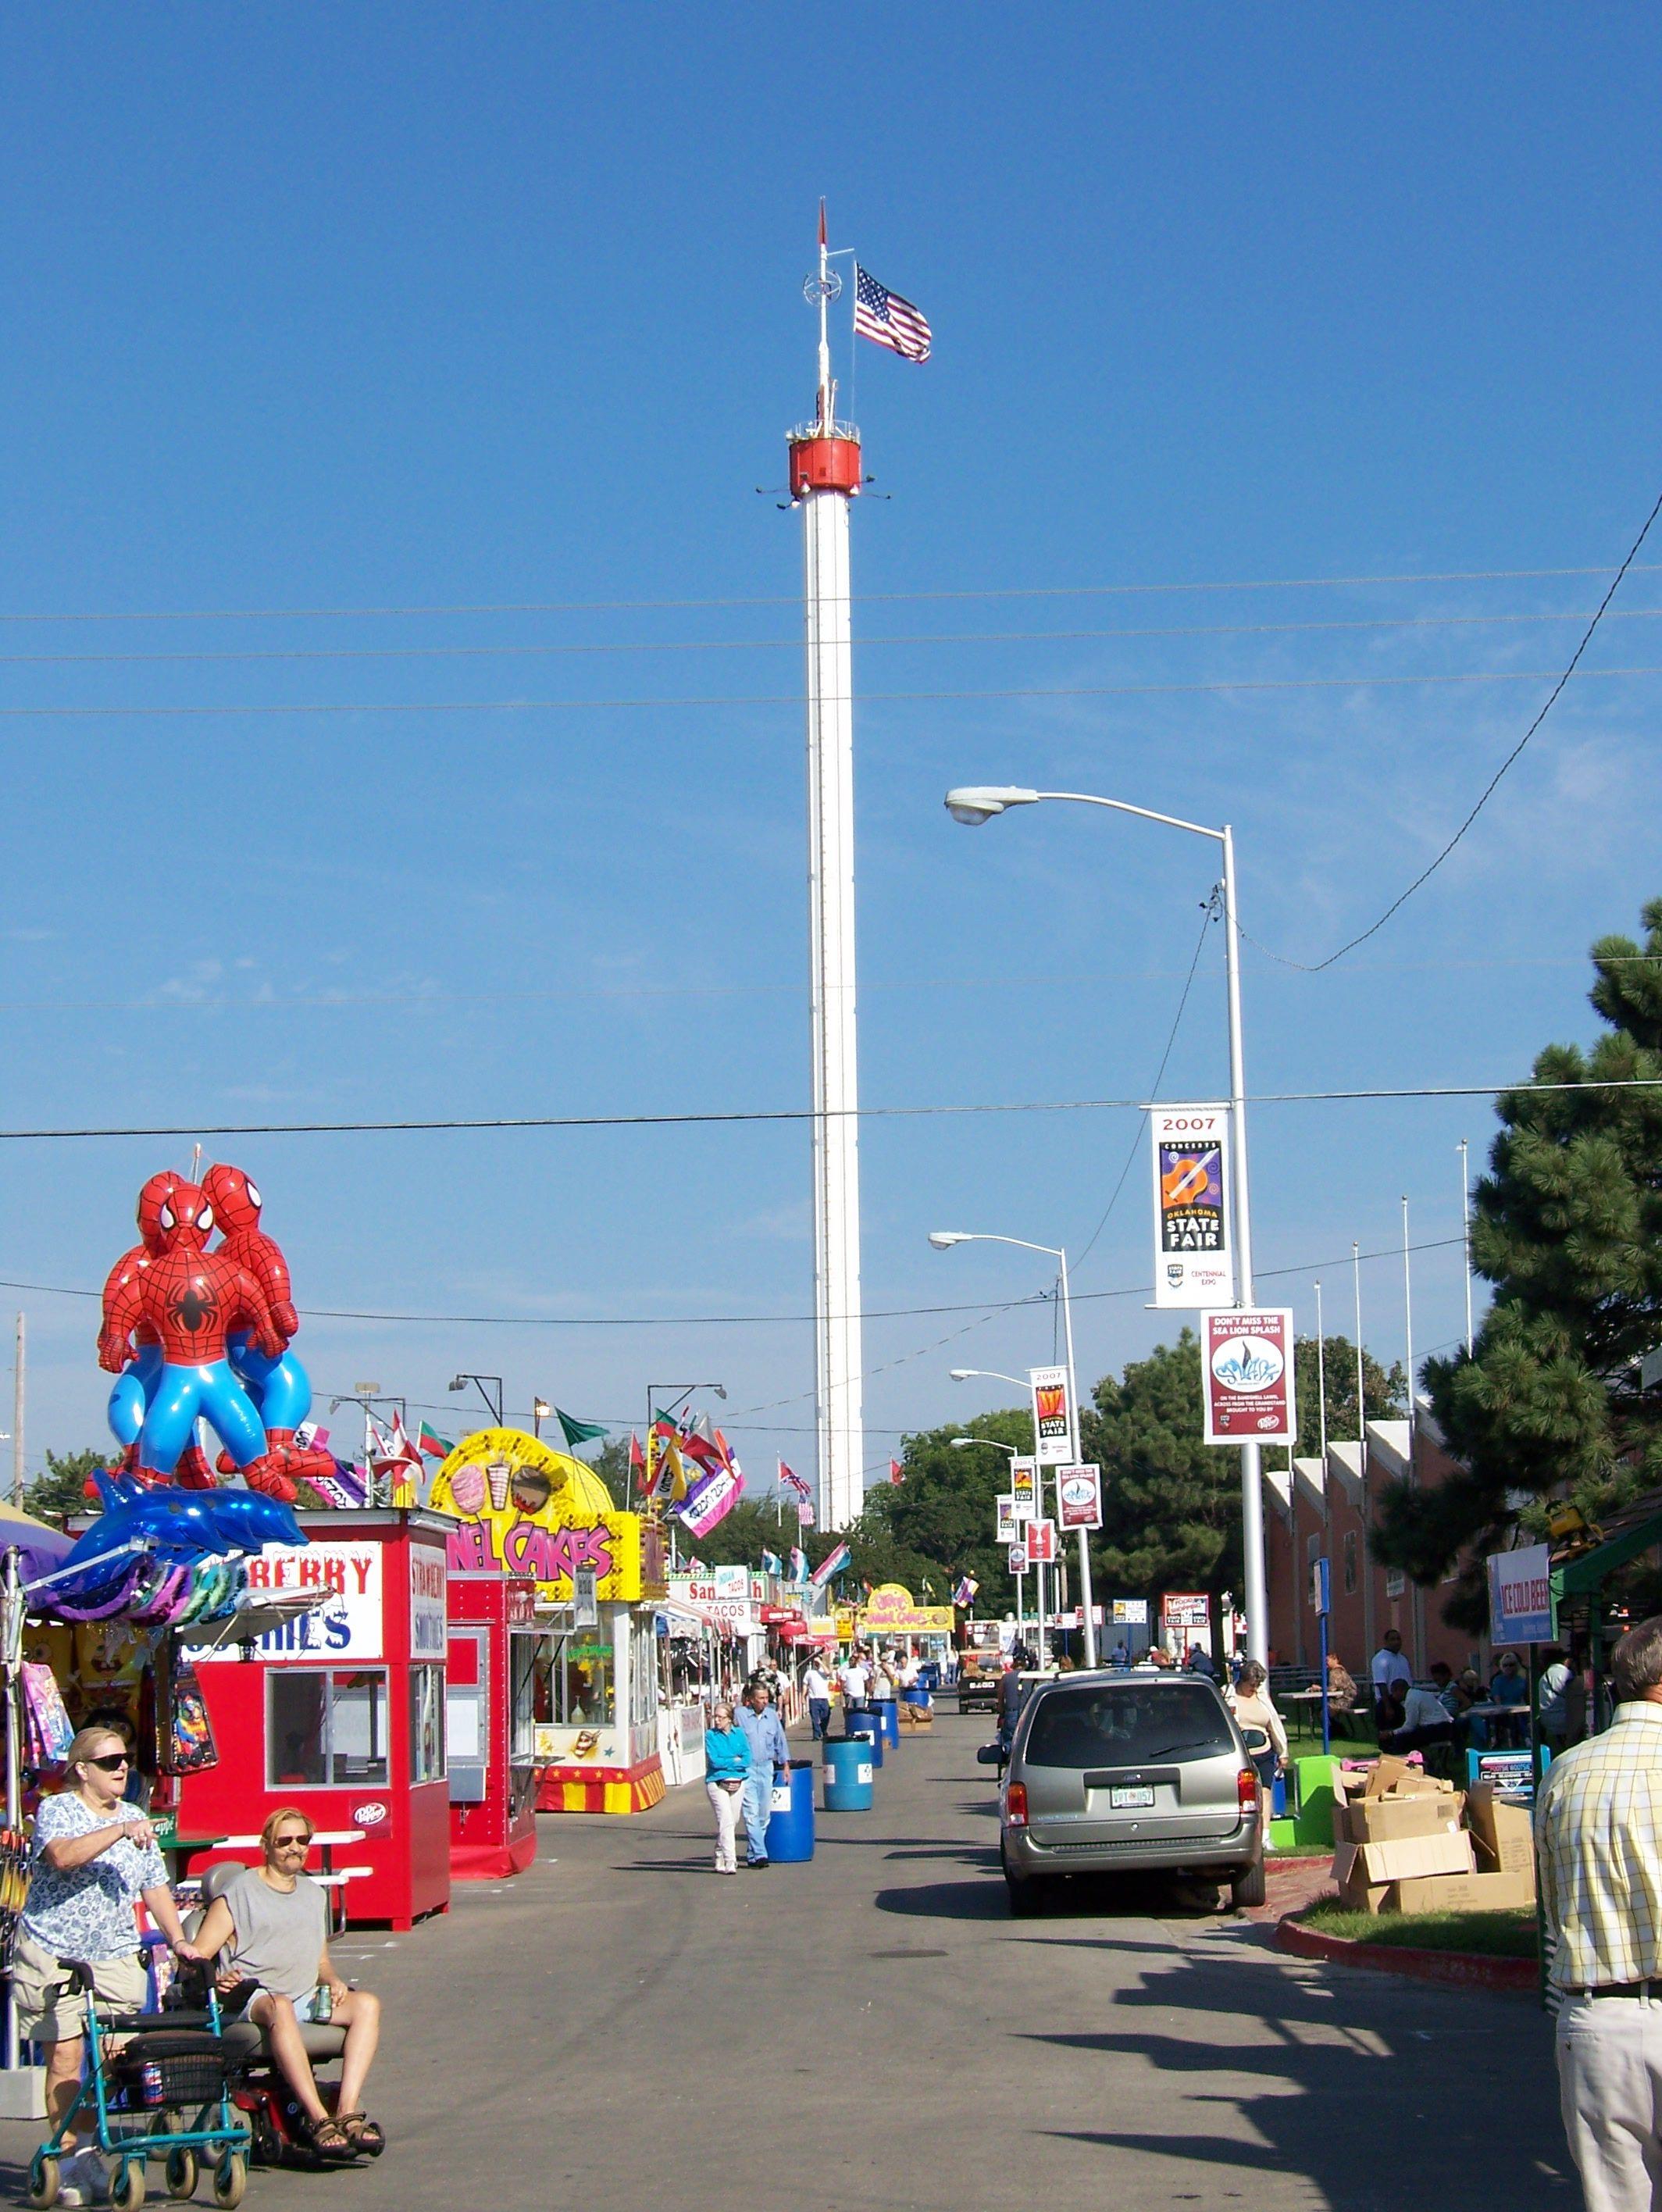 Space Needle Ok State Fair Oklahoma Space Needle Summertime Fun